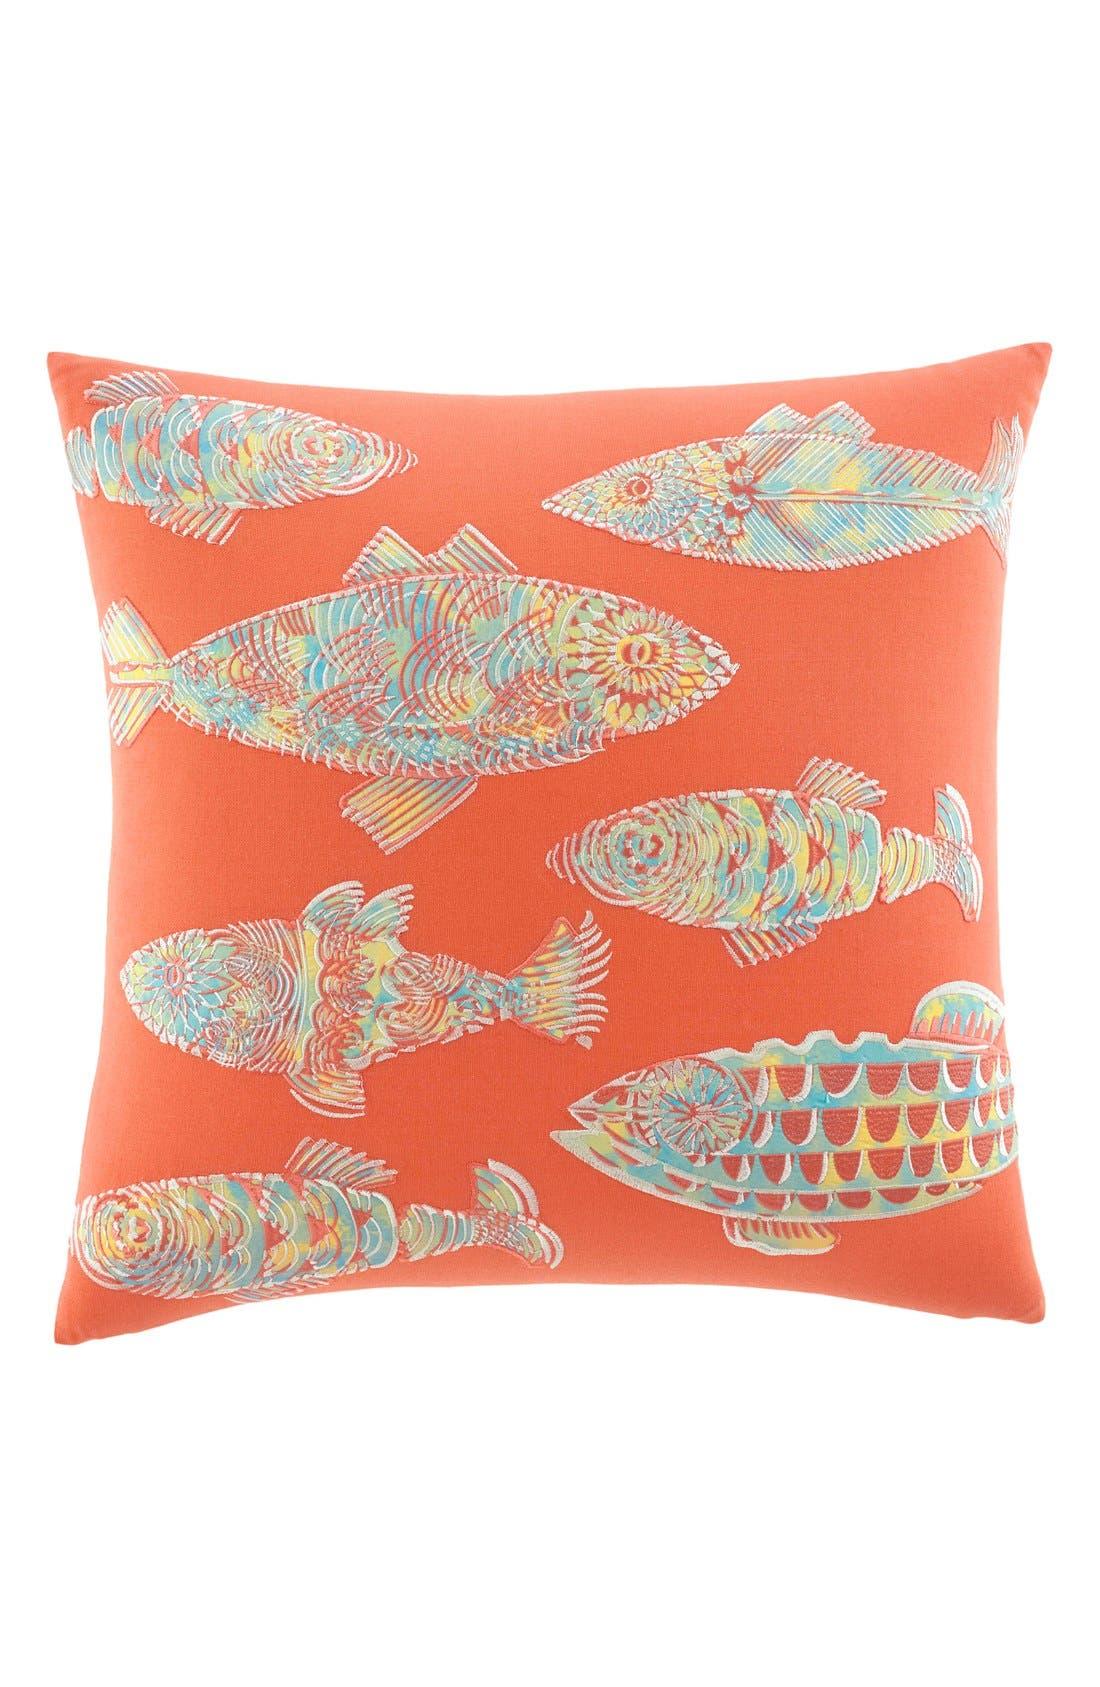 Tommy Bahama 'Batic Fish' Pillow